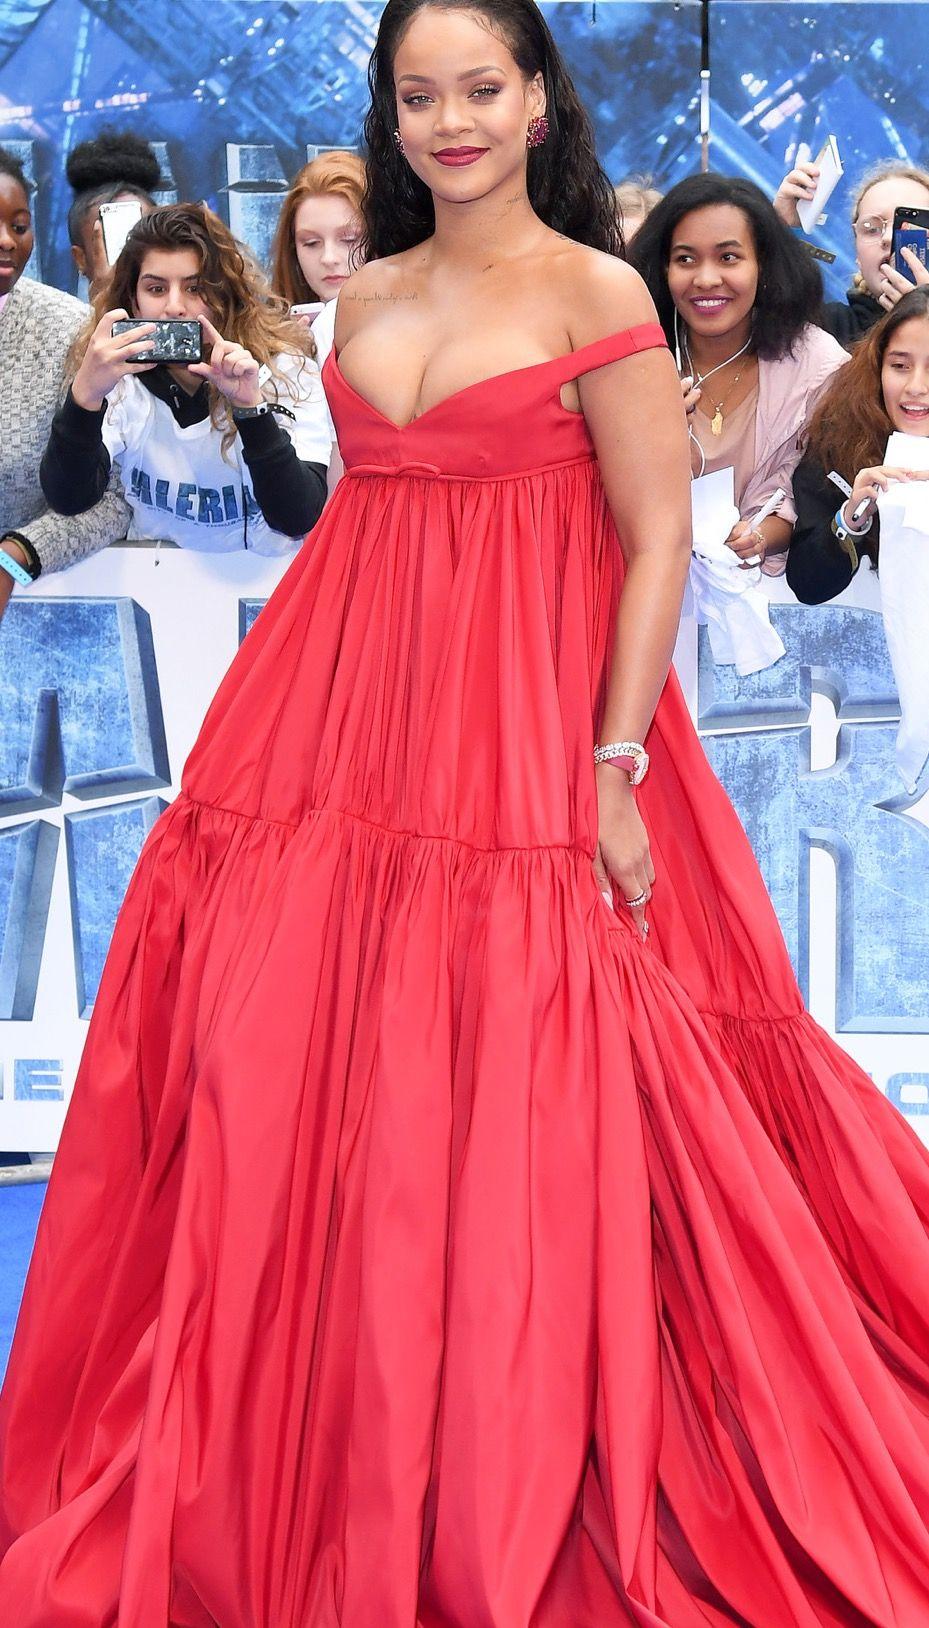 Rihanna Rihanna, Queen of Fashion and General Badassery ...